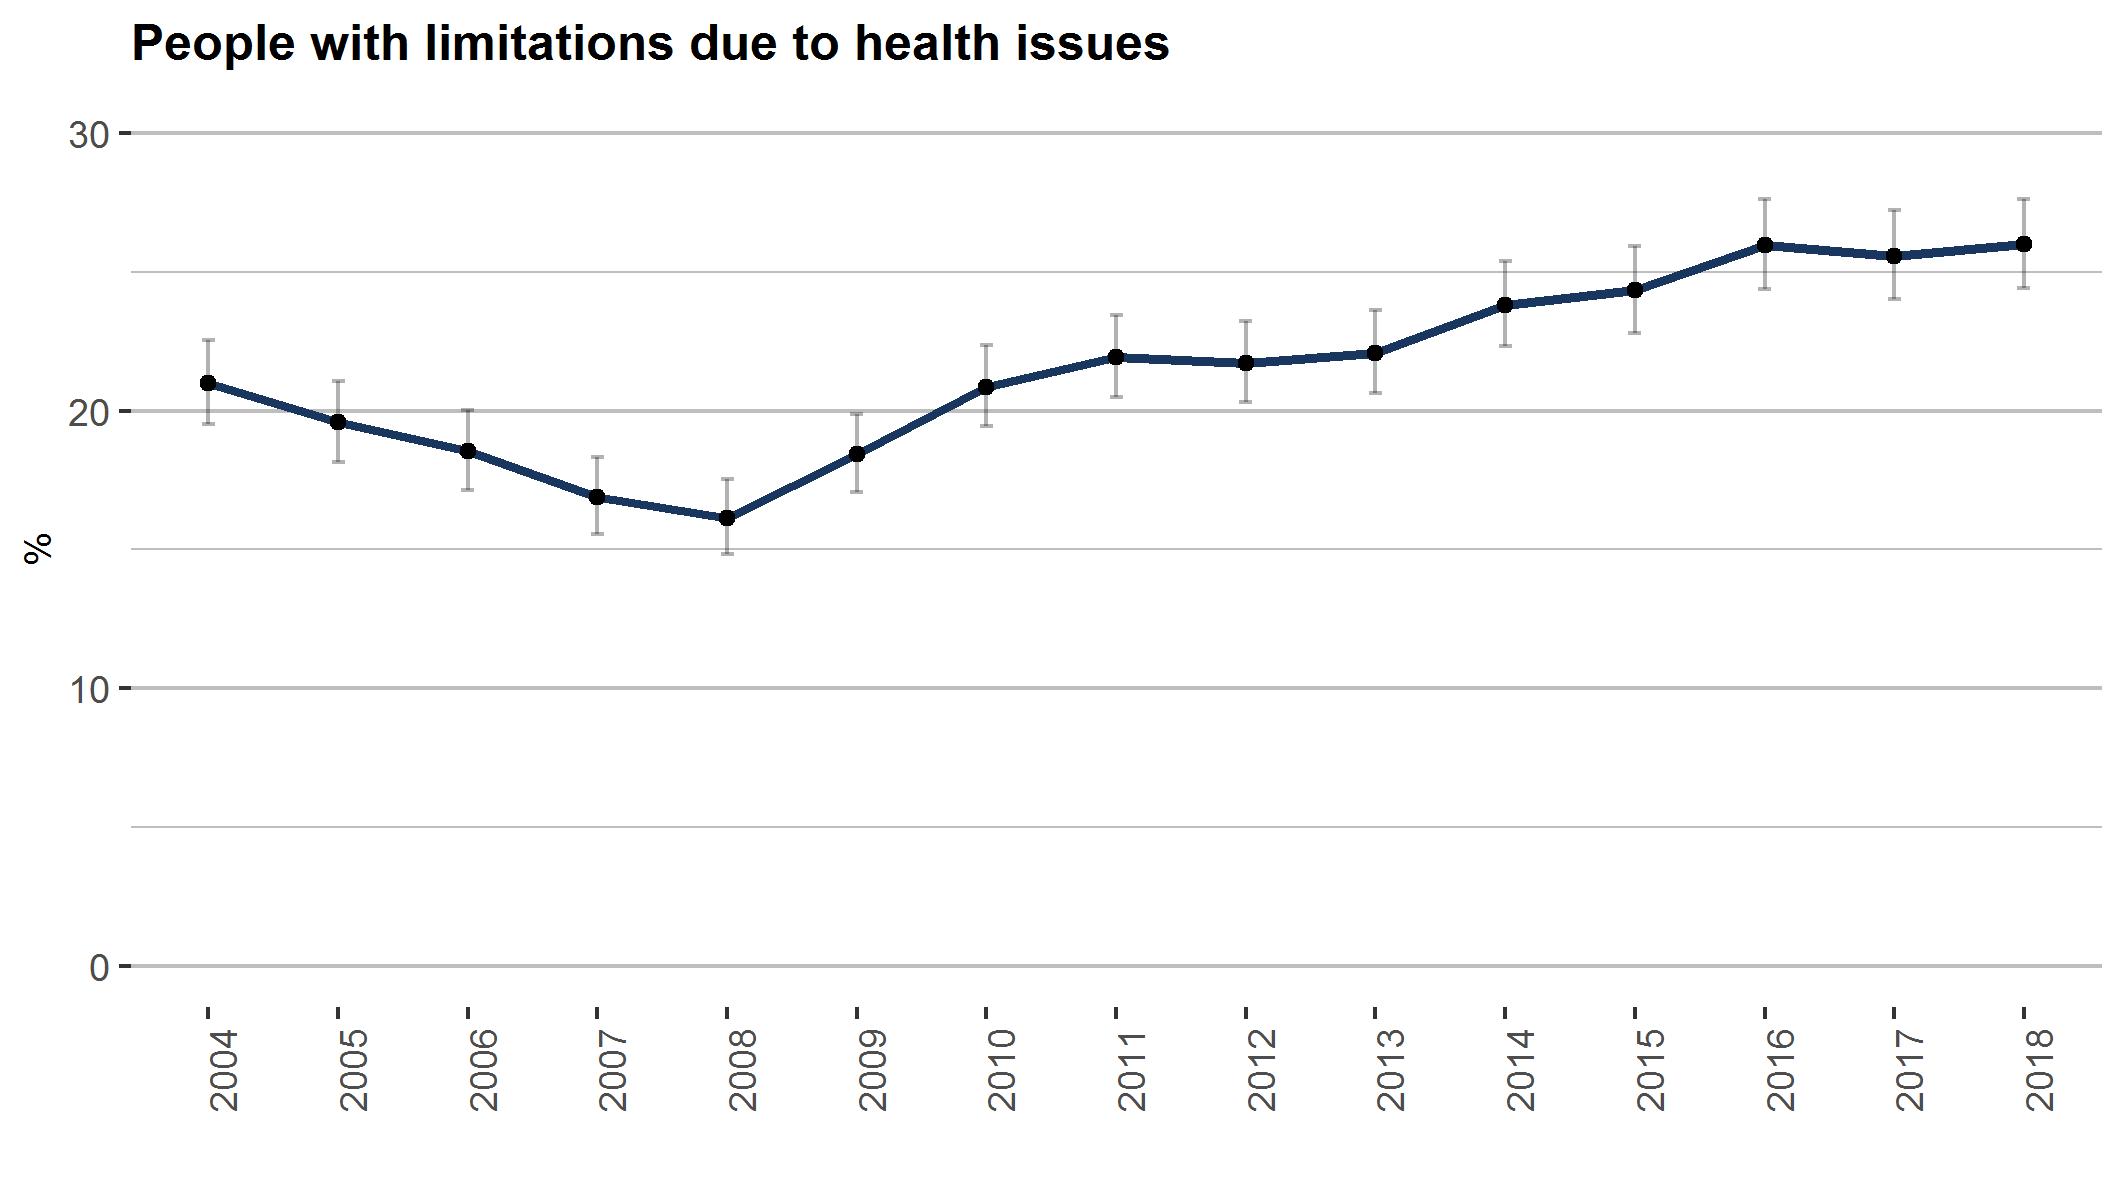 health-limitations